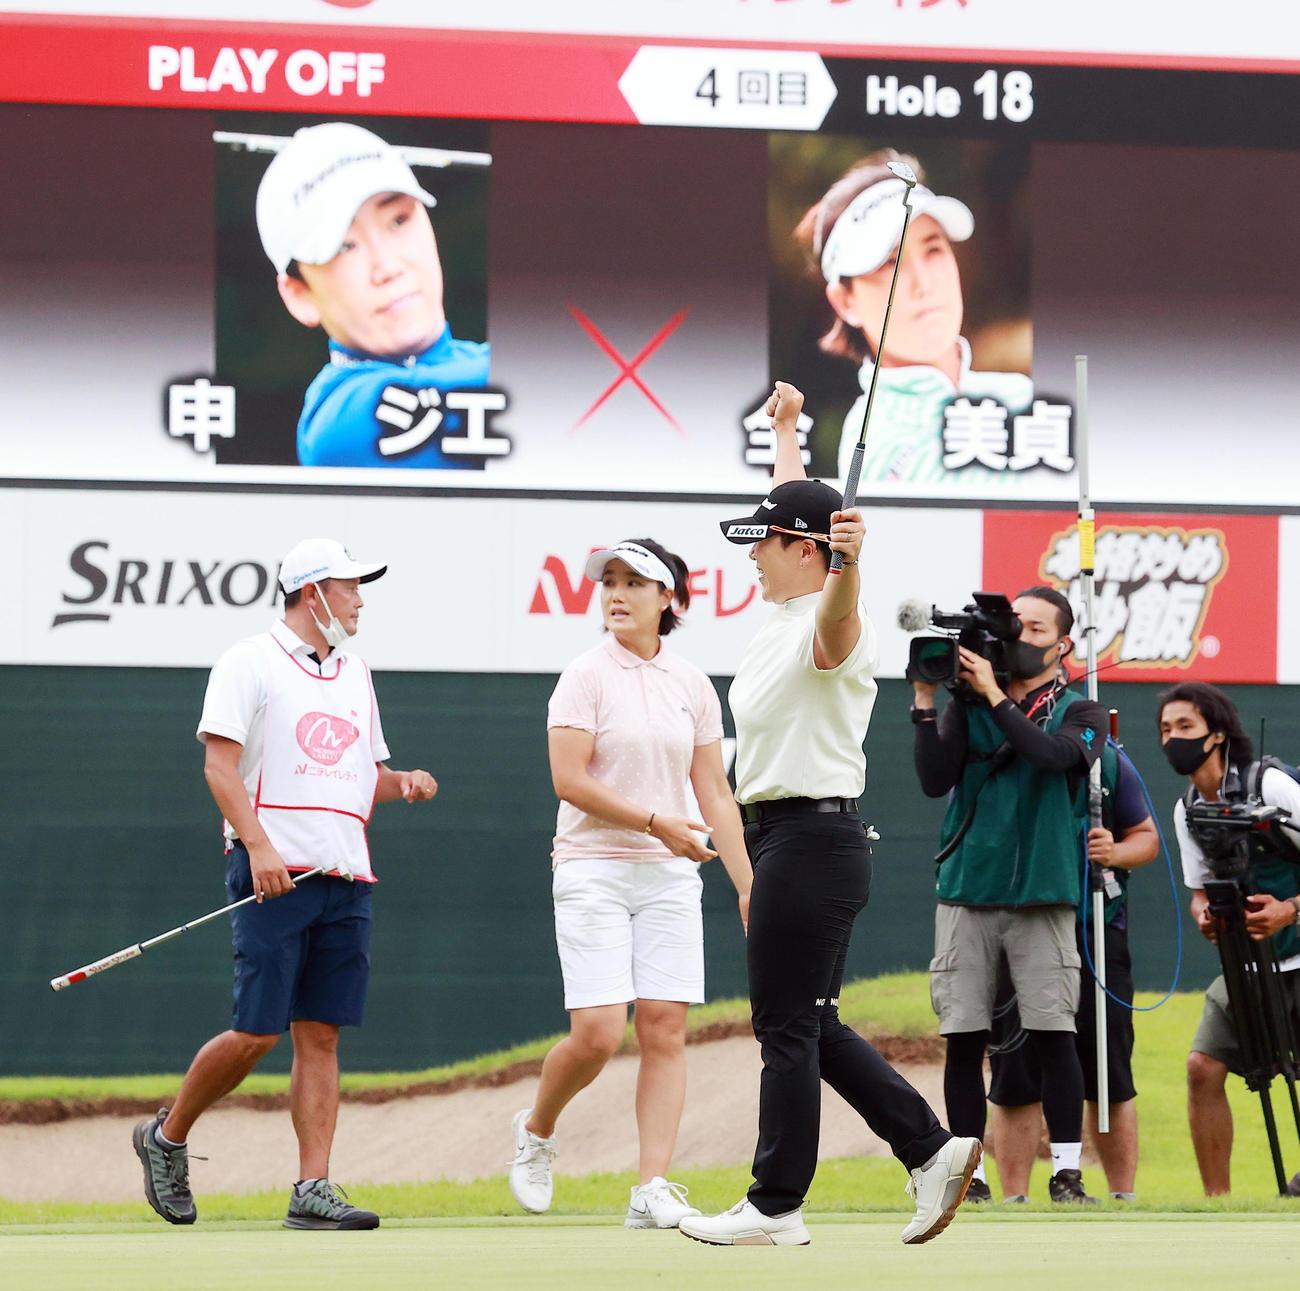 https://www.nikkansports.com/sports/golf/news/img/202106200000763-w1300_1.jpg